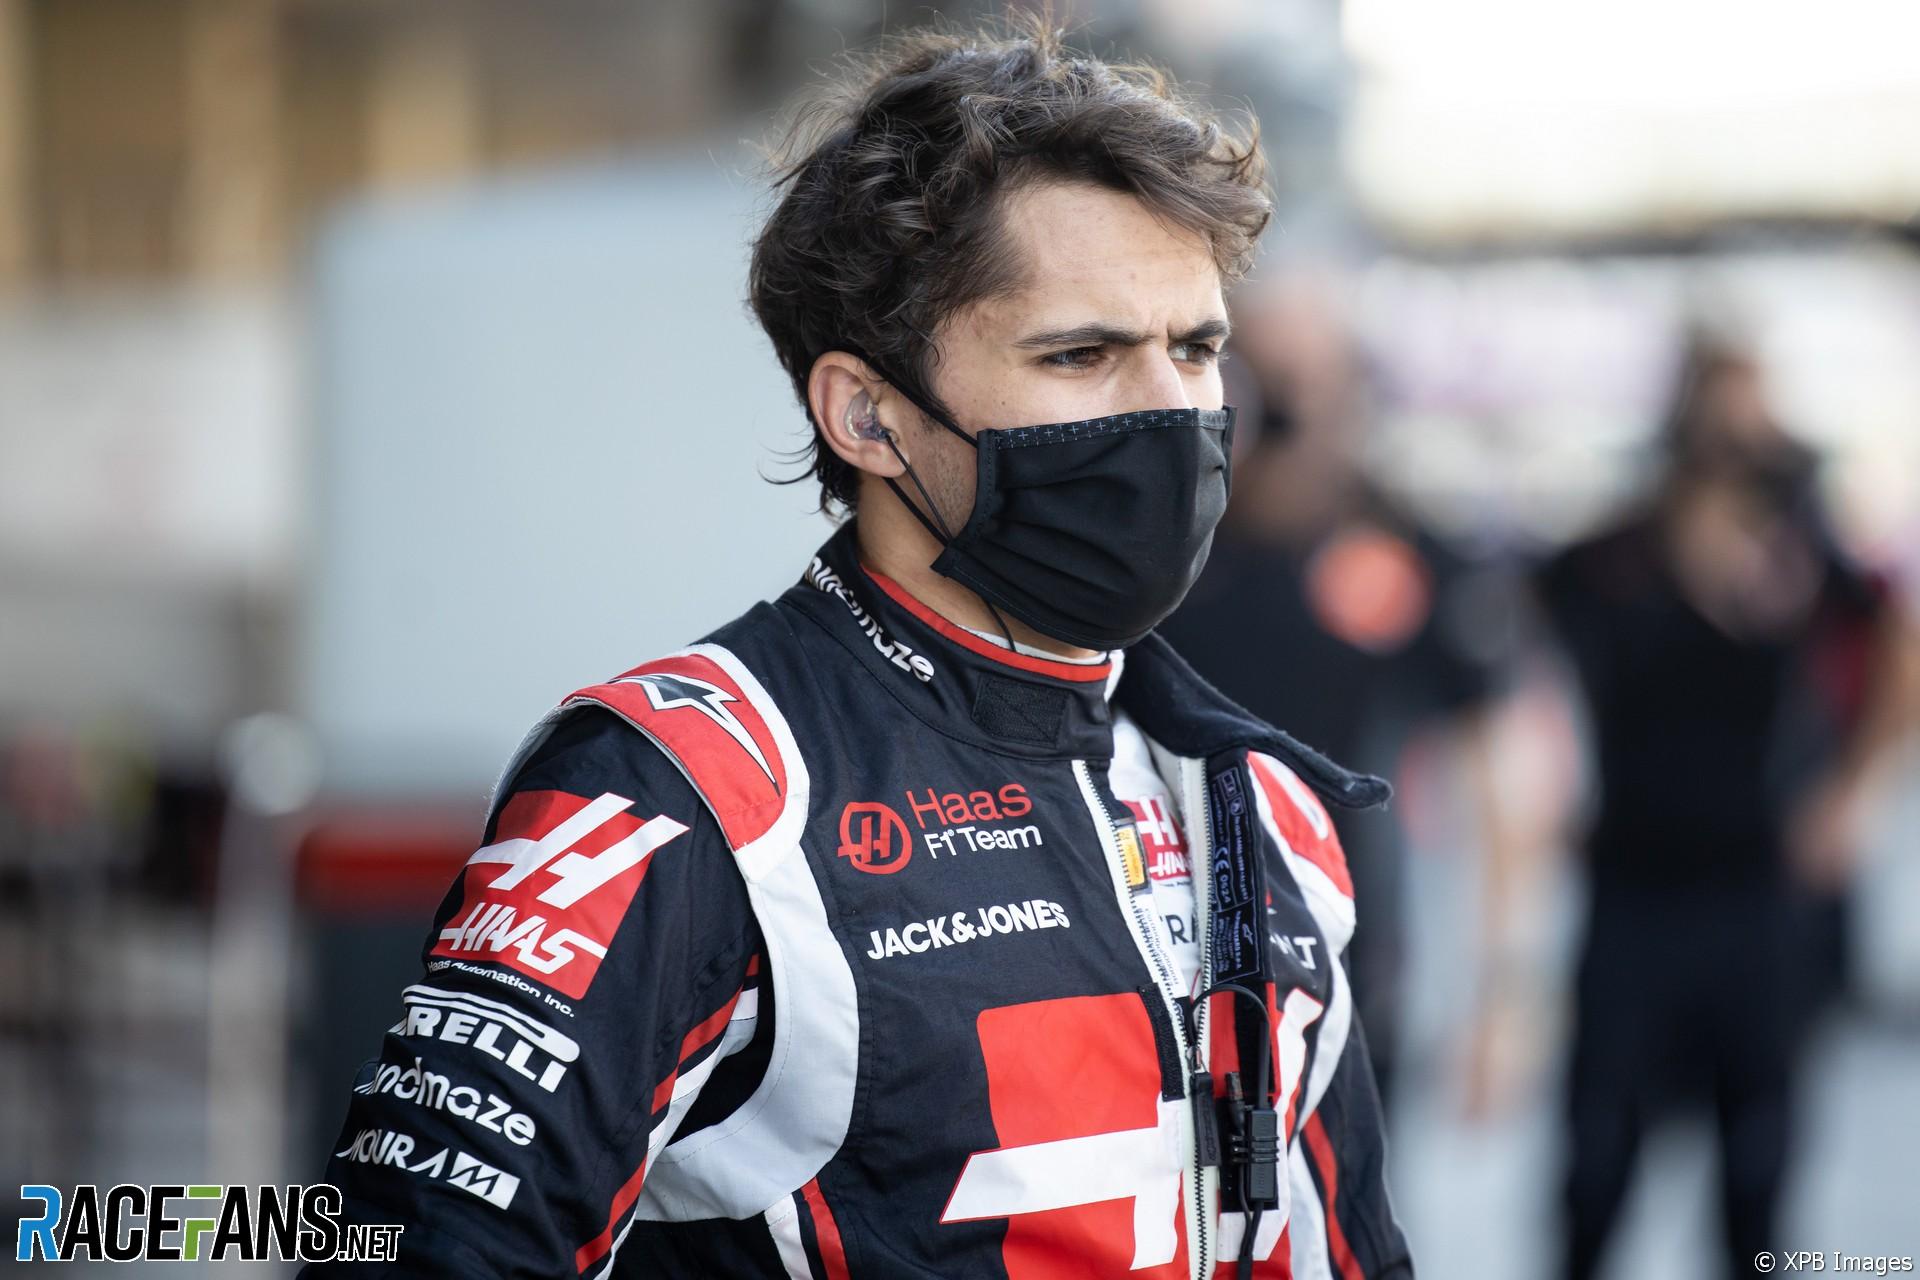 Pietro Fittipaldi, Haas, Yas Marina, 2020